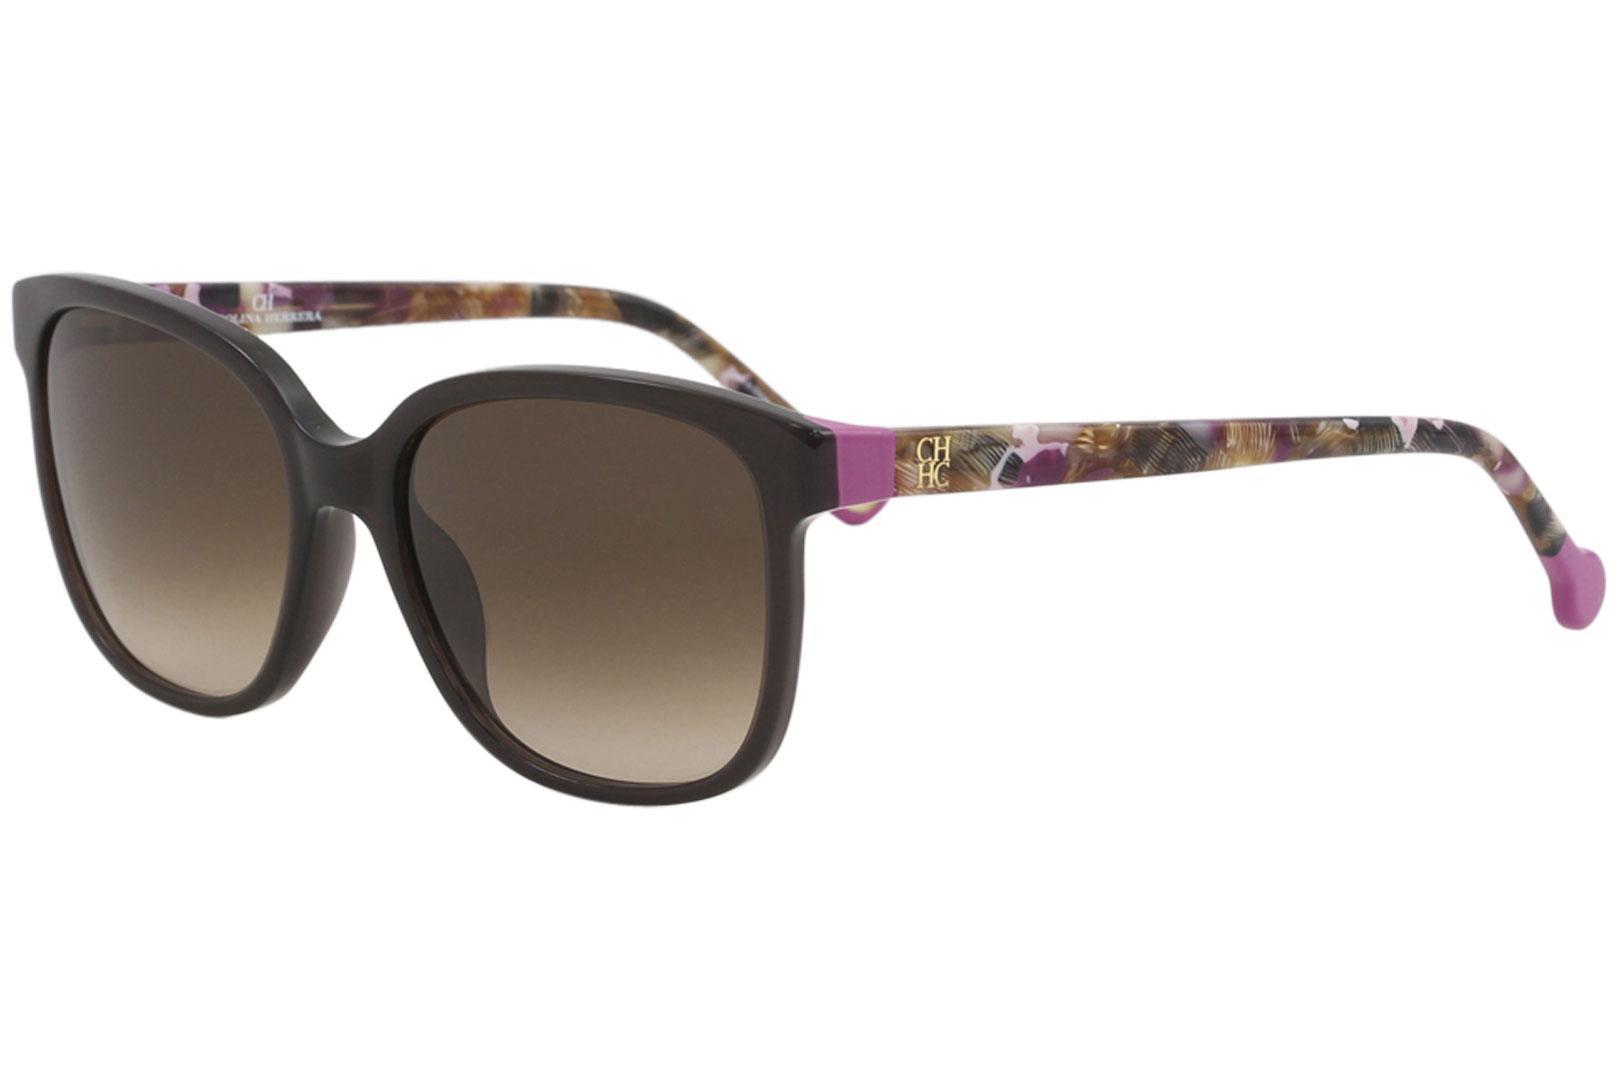 d8647af685 CH Carolina Herrera Women s SHE687 SHE 687 Fashion Square Sunglasses by Carolina  Herrera